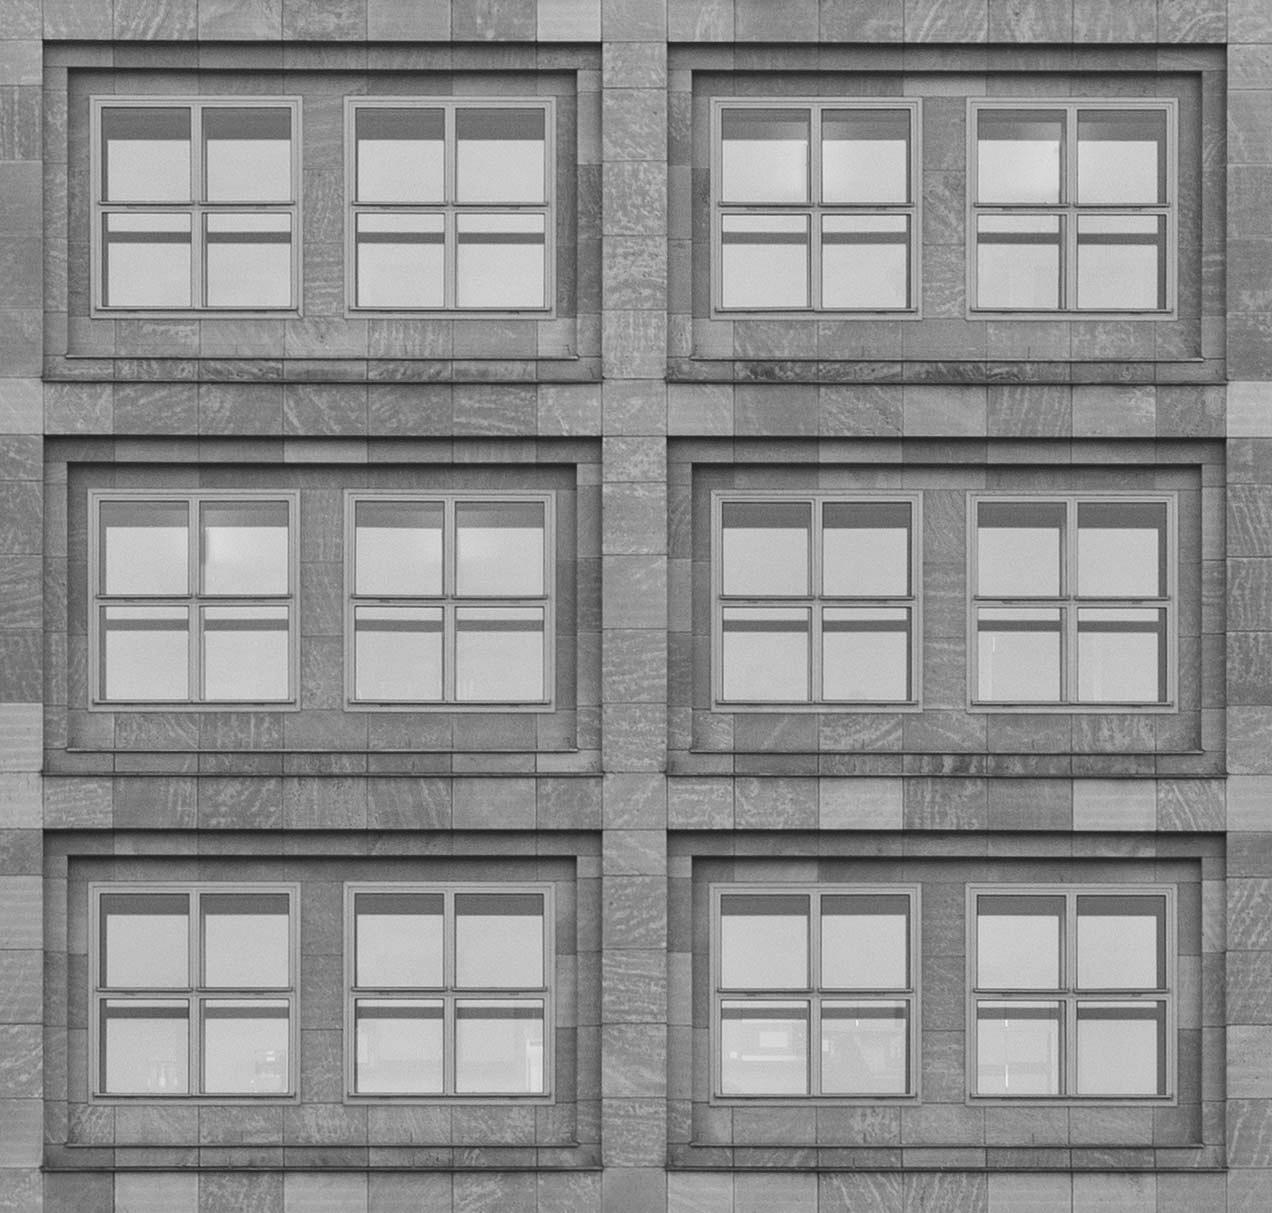 Fassade 5